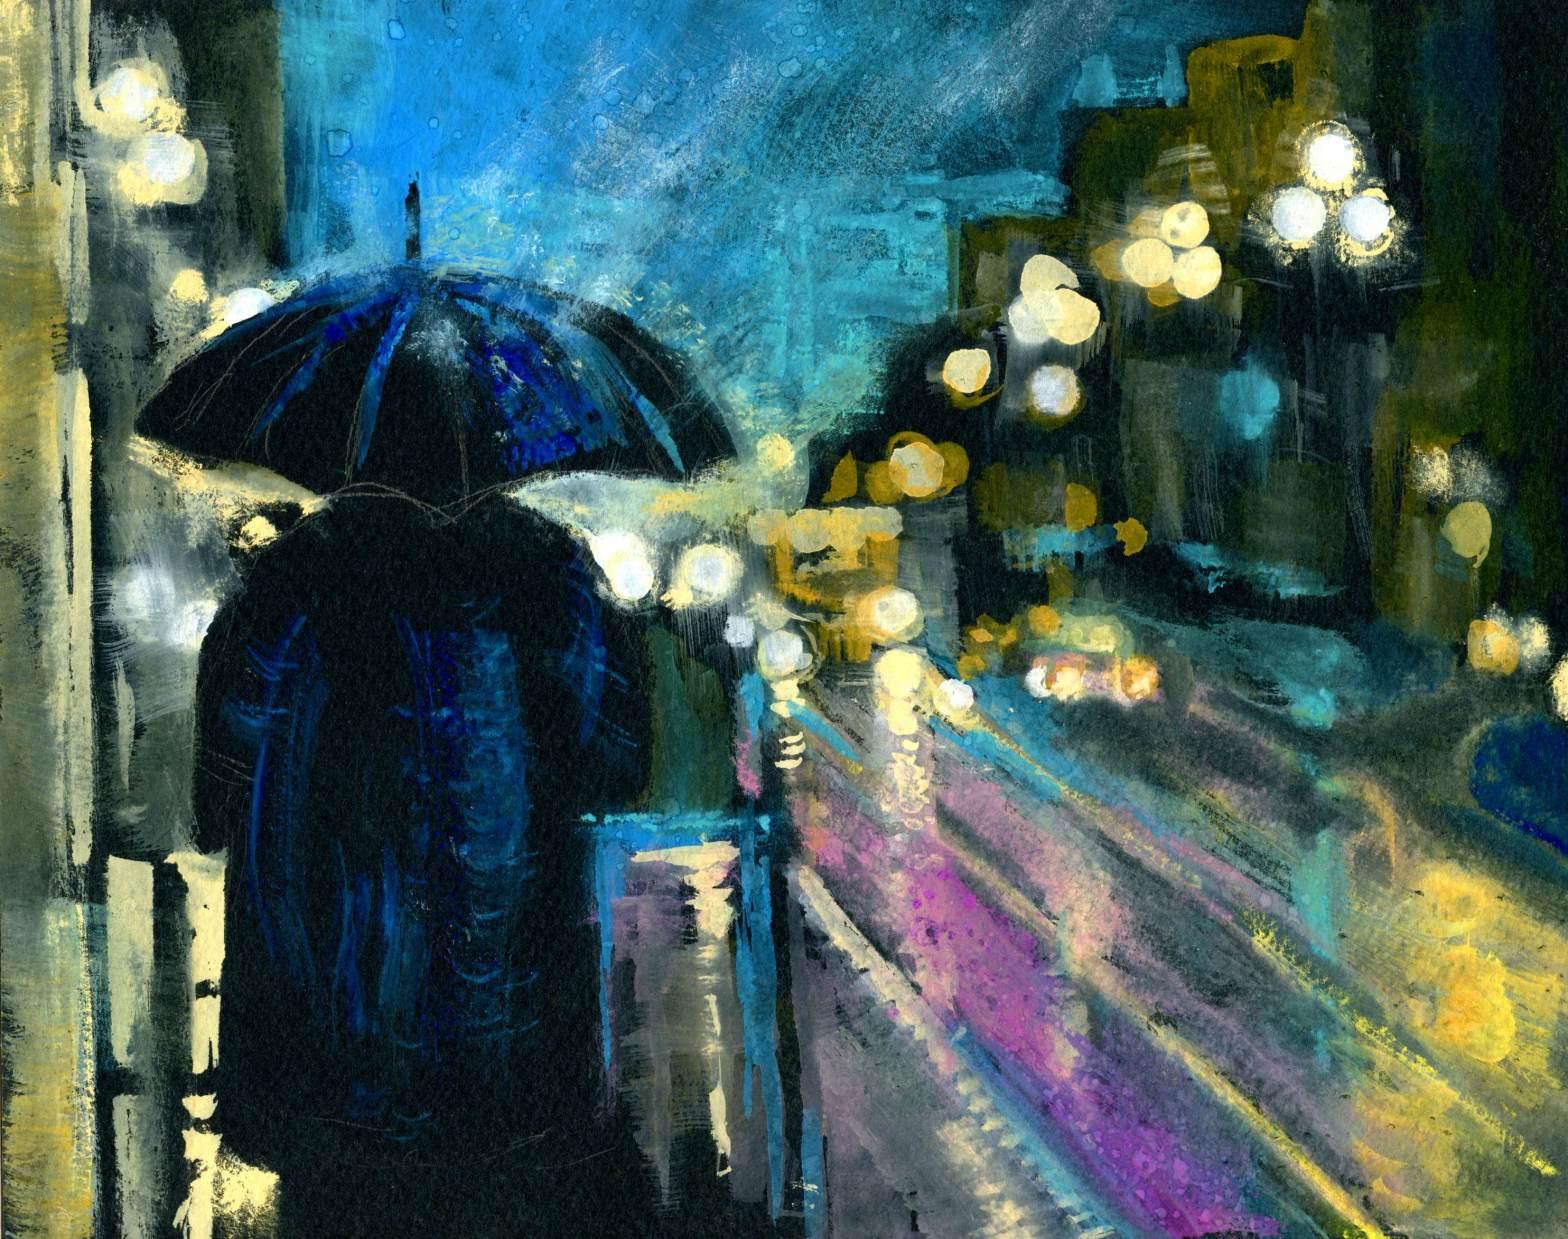 Rain And Reflections Life Imitates Doodles